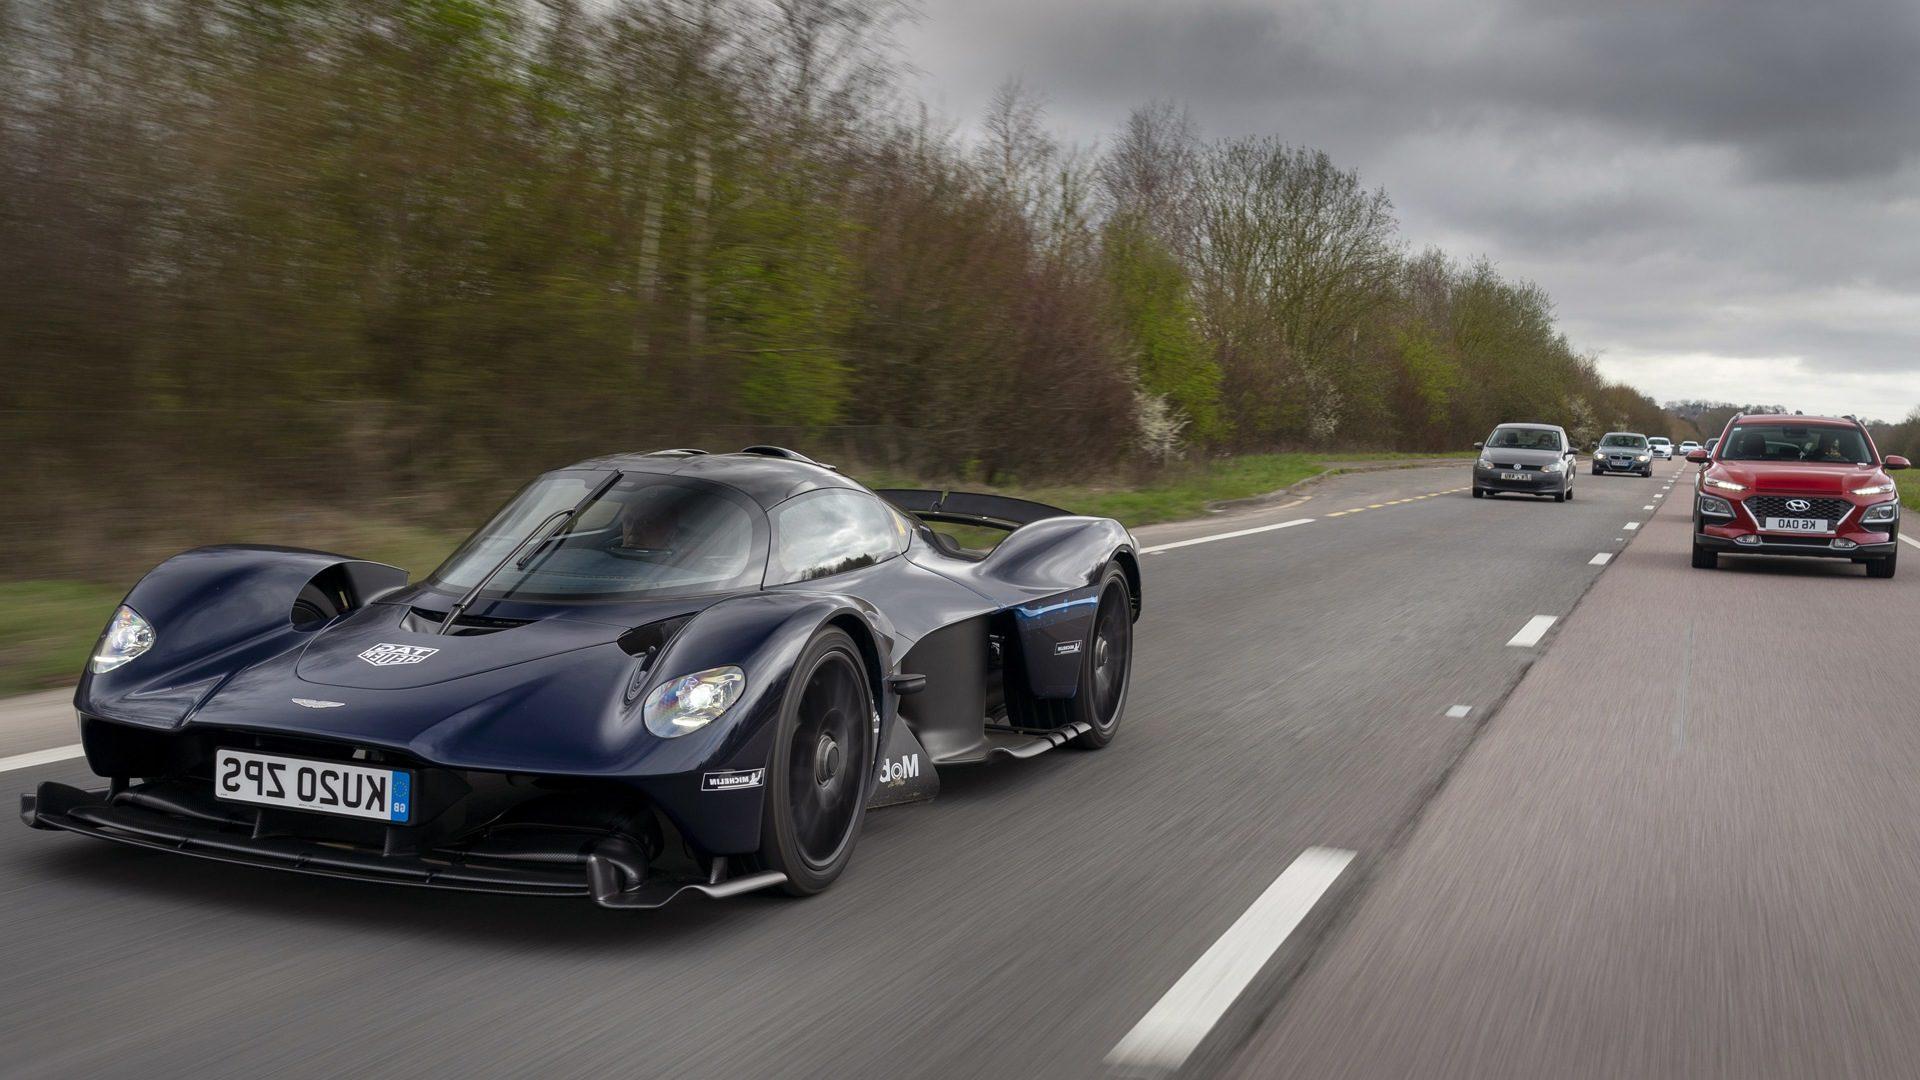 Aston Martin Shares Photos From 1160 Horsepower Valkyrie S Test Drive Somag News